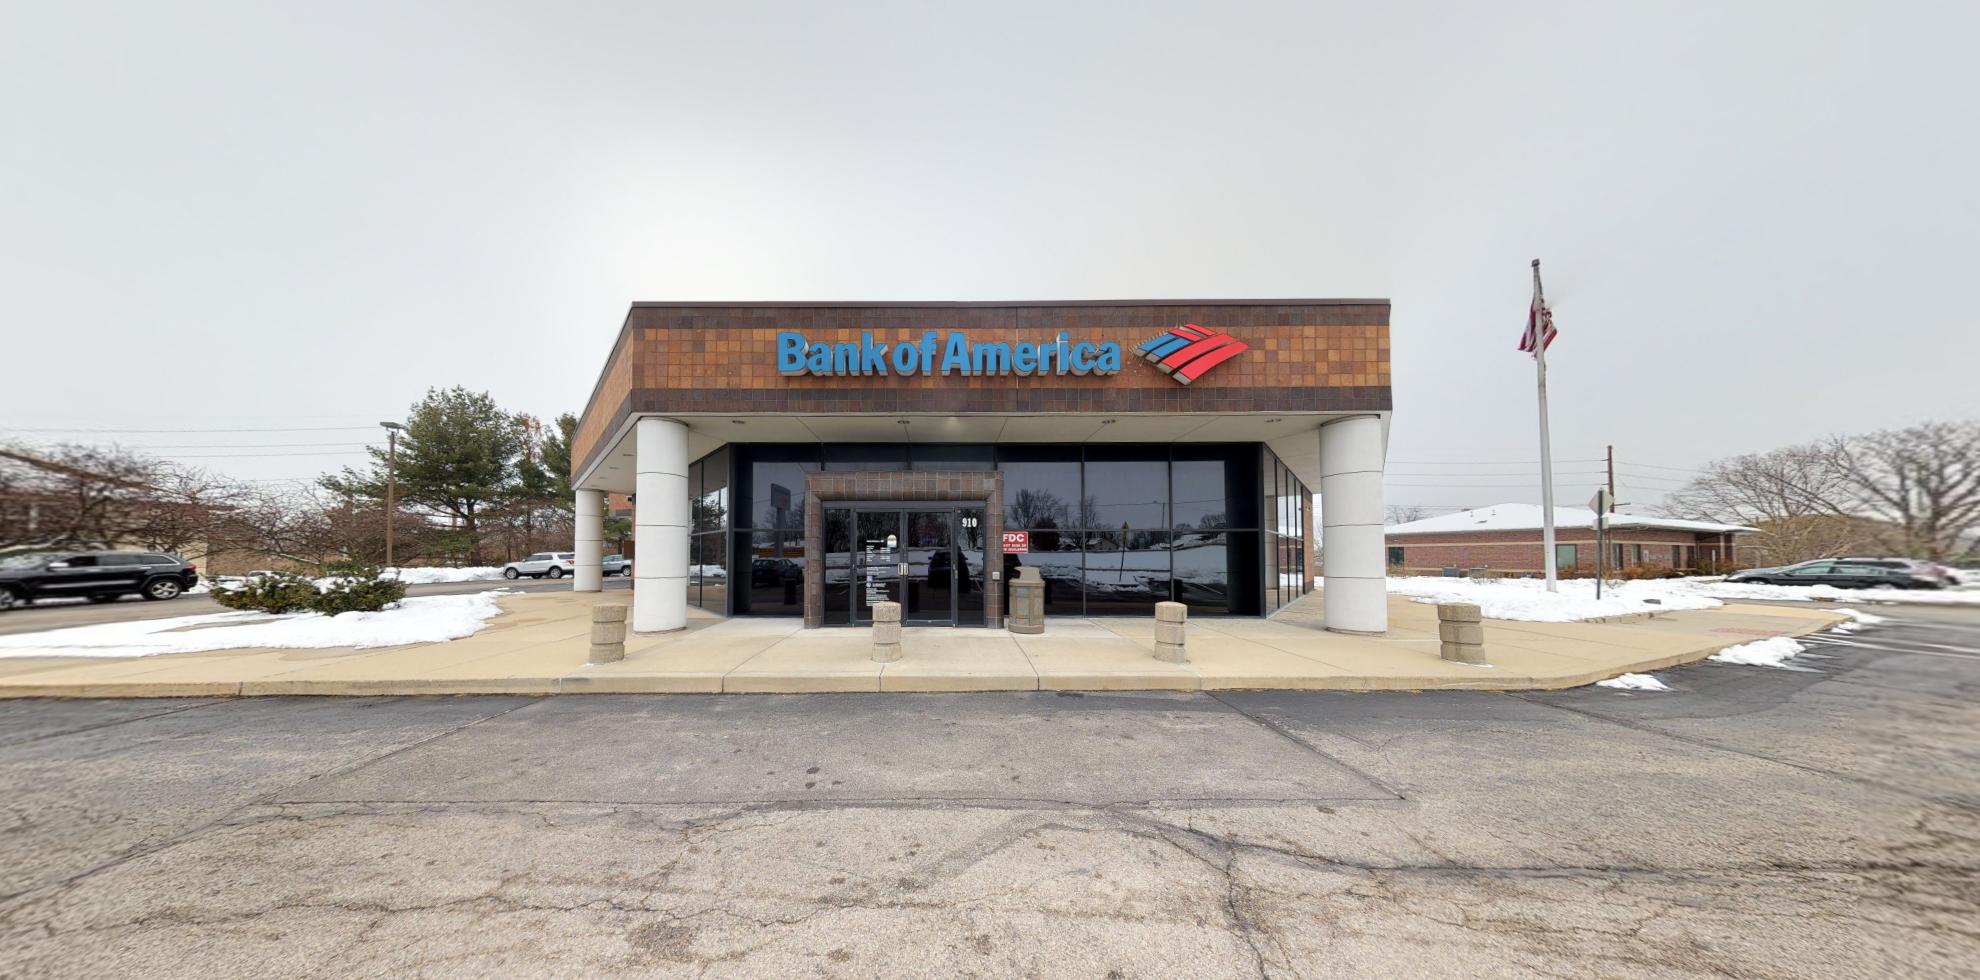 Bank of America financial center with drive-thru ATM   910 Talon Dr, O Fallon, IL 62269